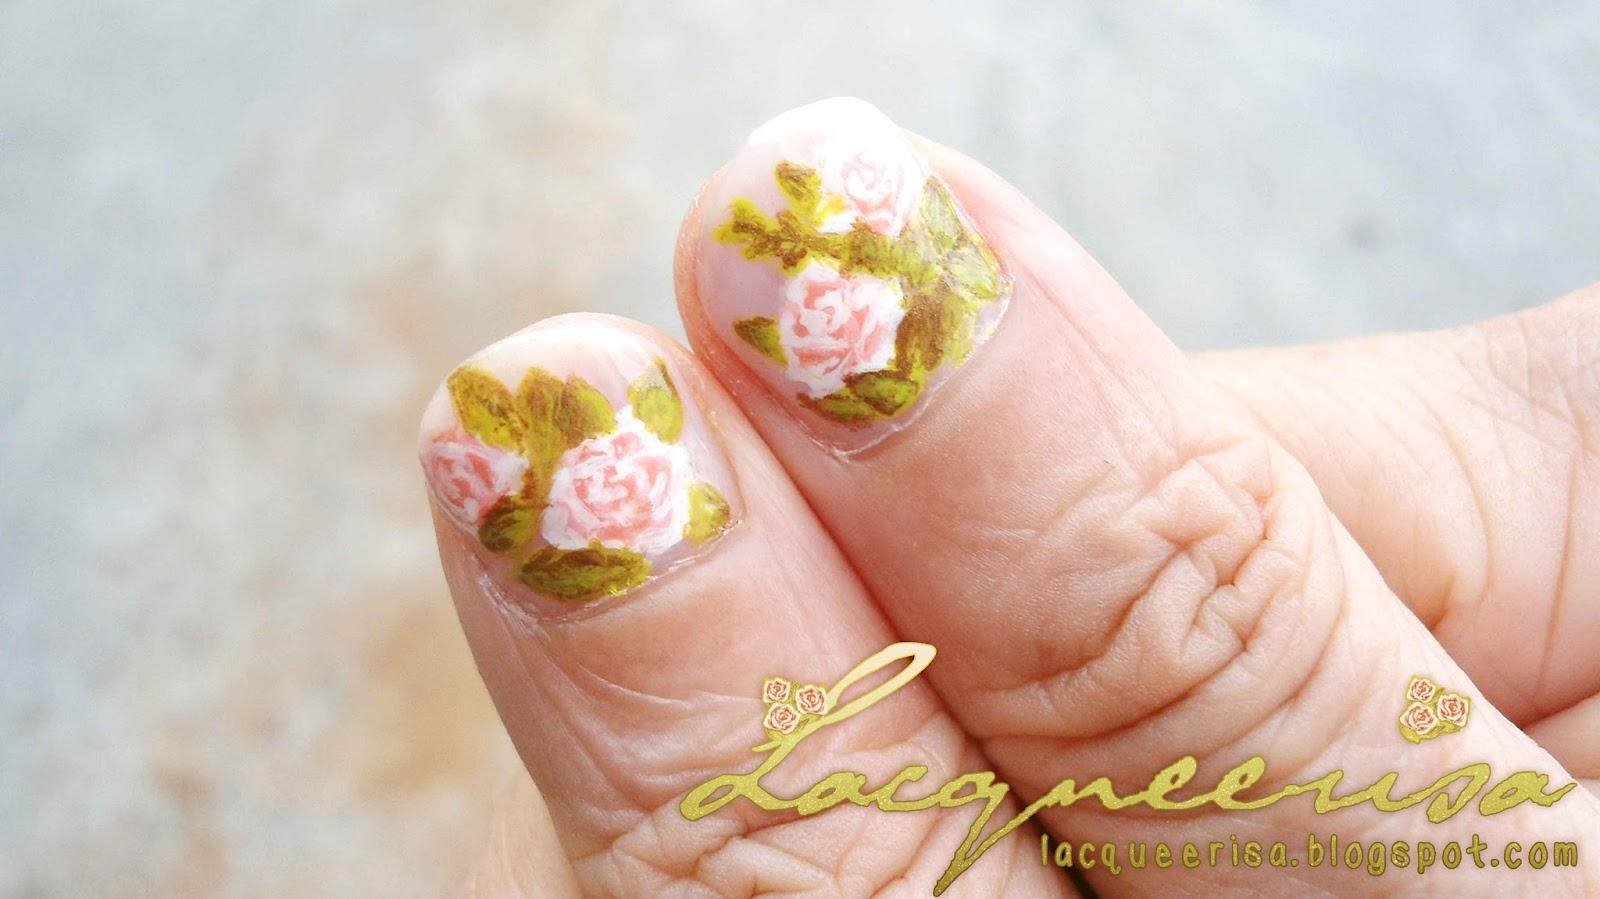 Lacqueerisa: Garden of Roses